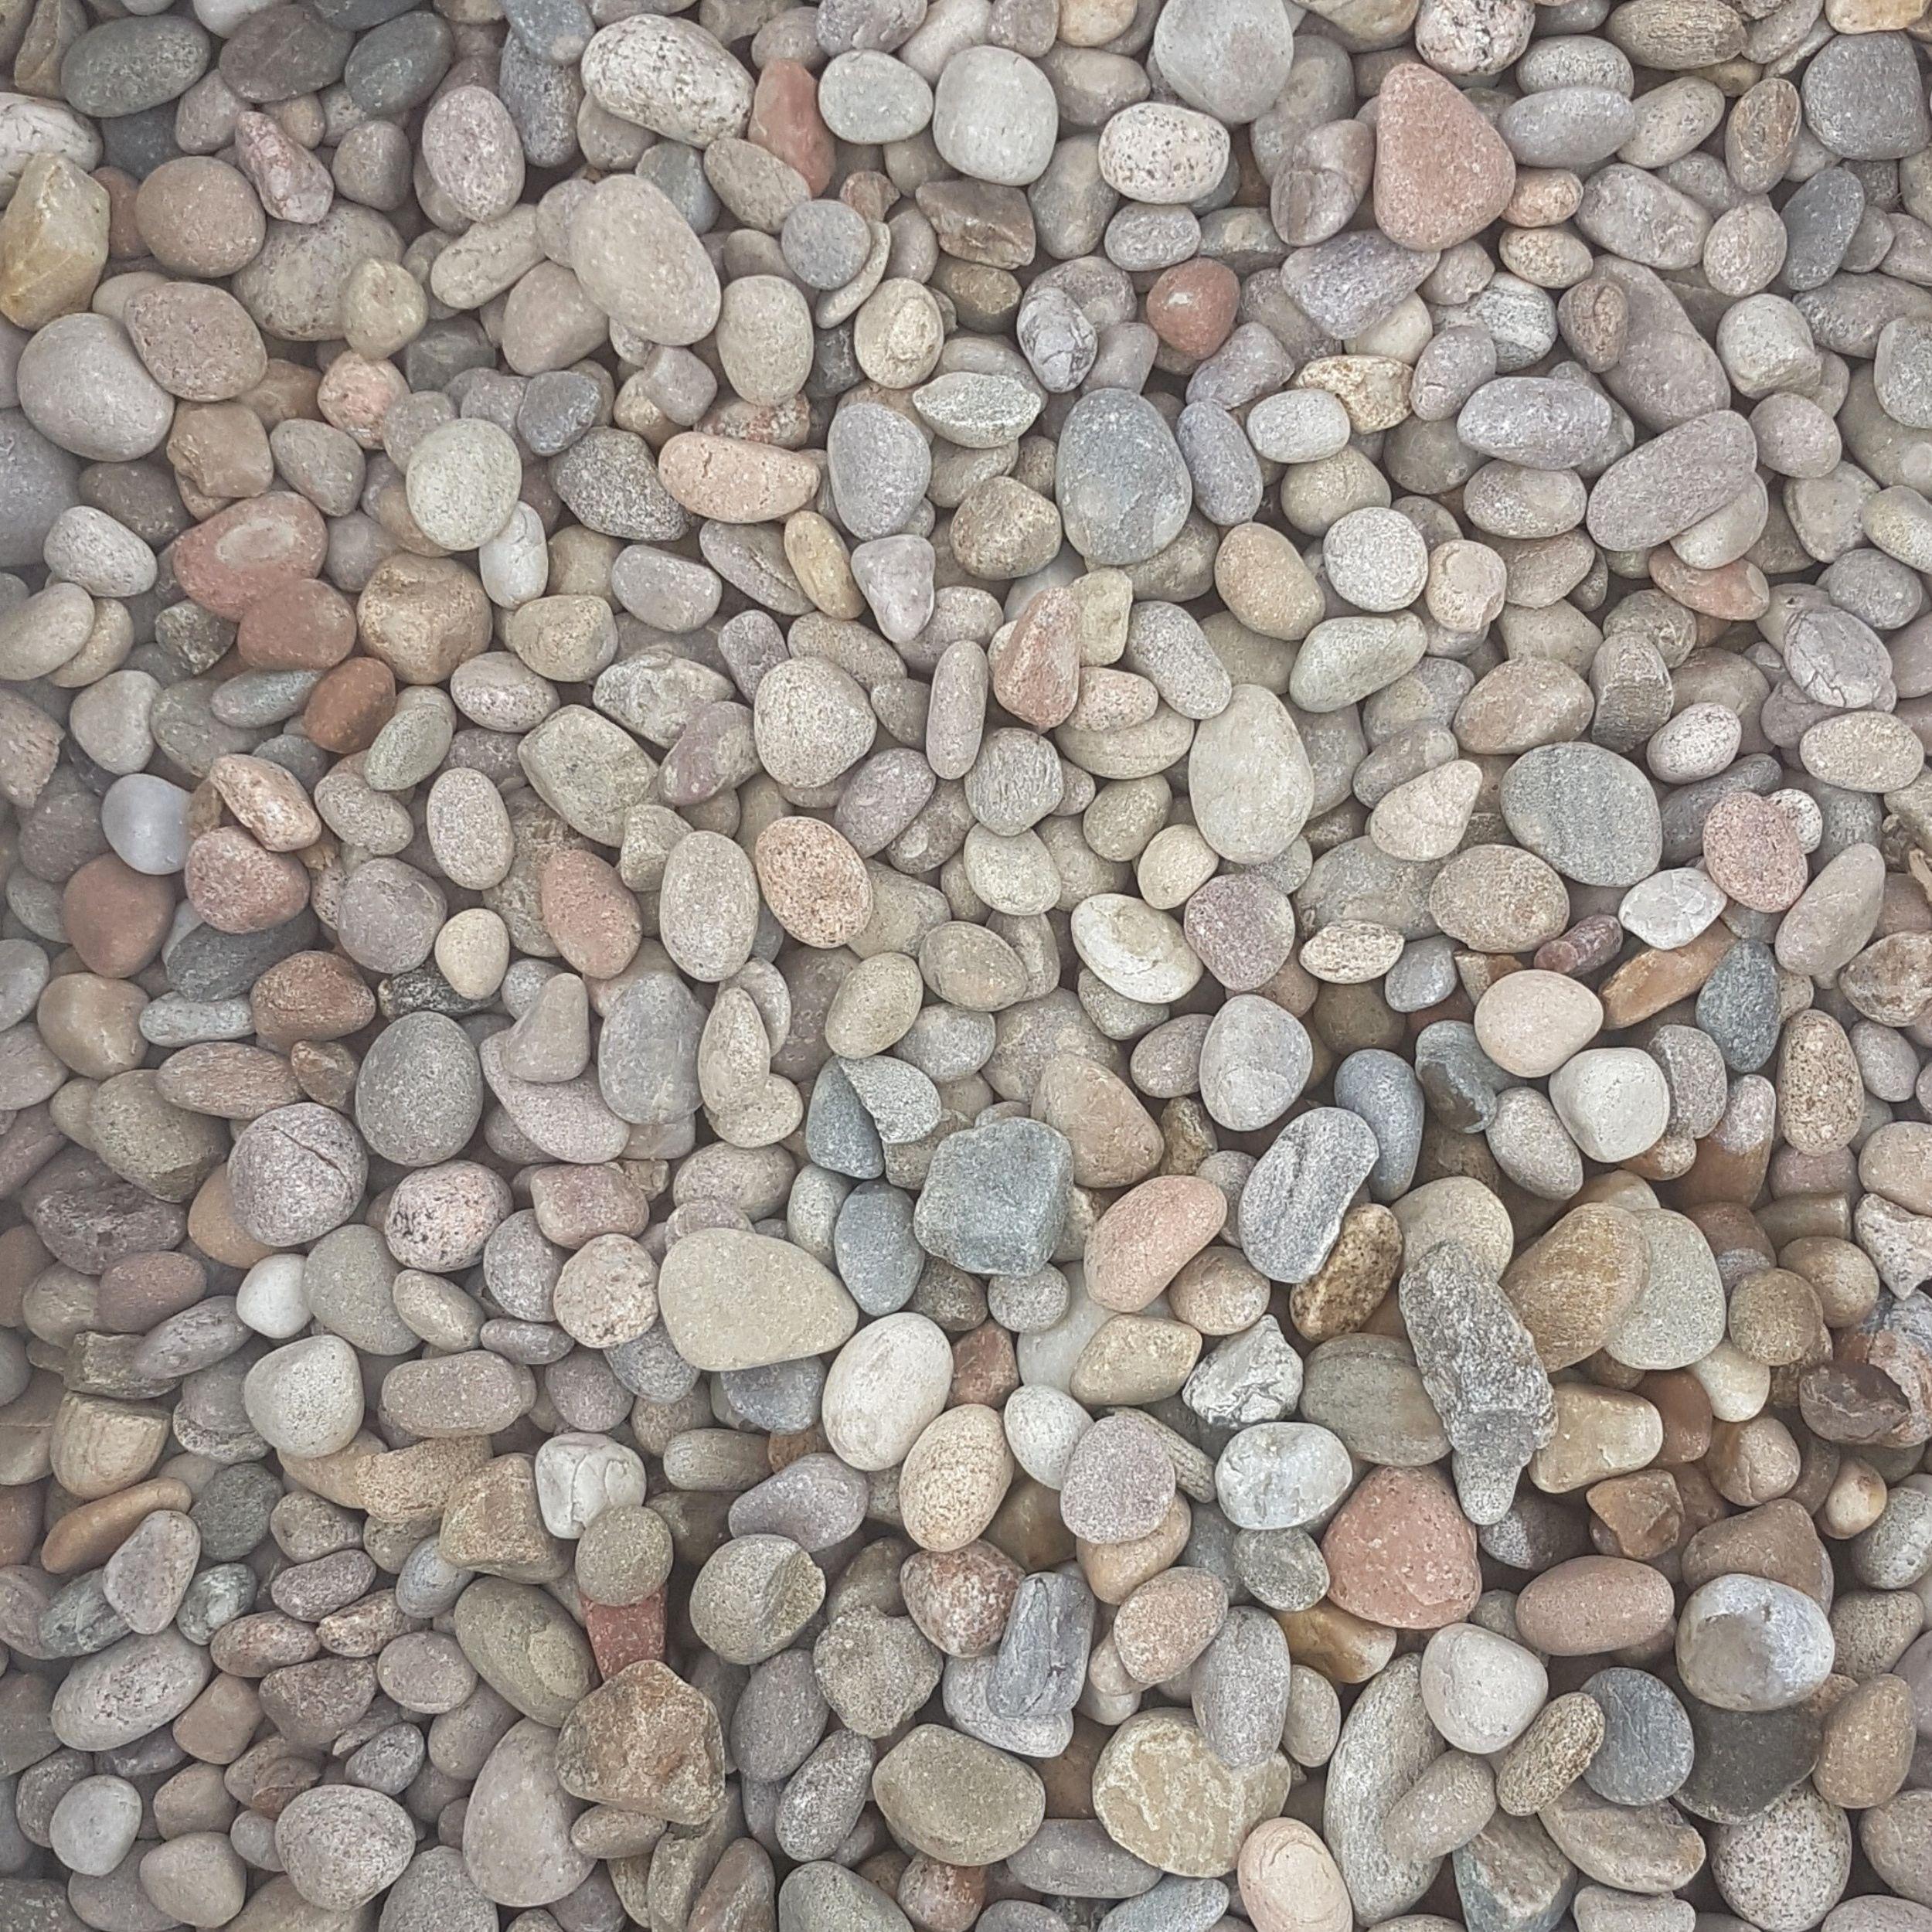 scottish pebble stones 20mm 40mm mitchell turf